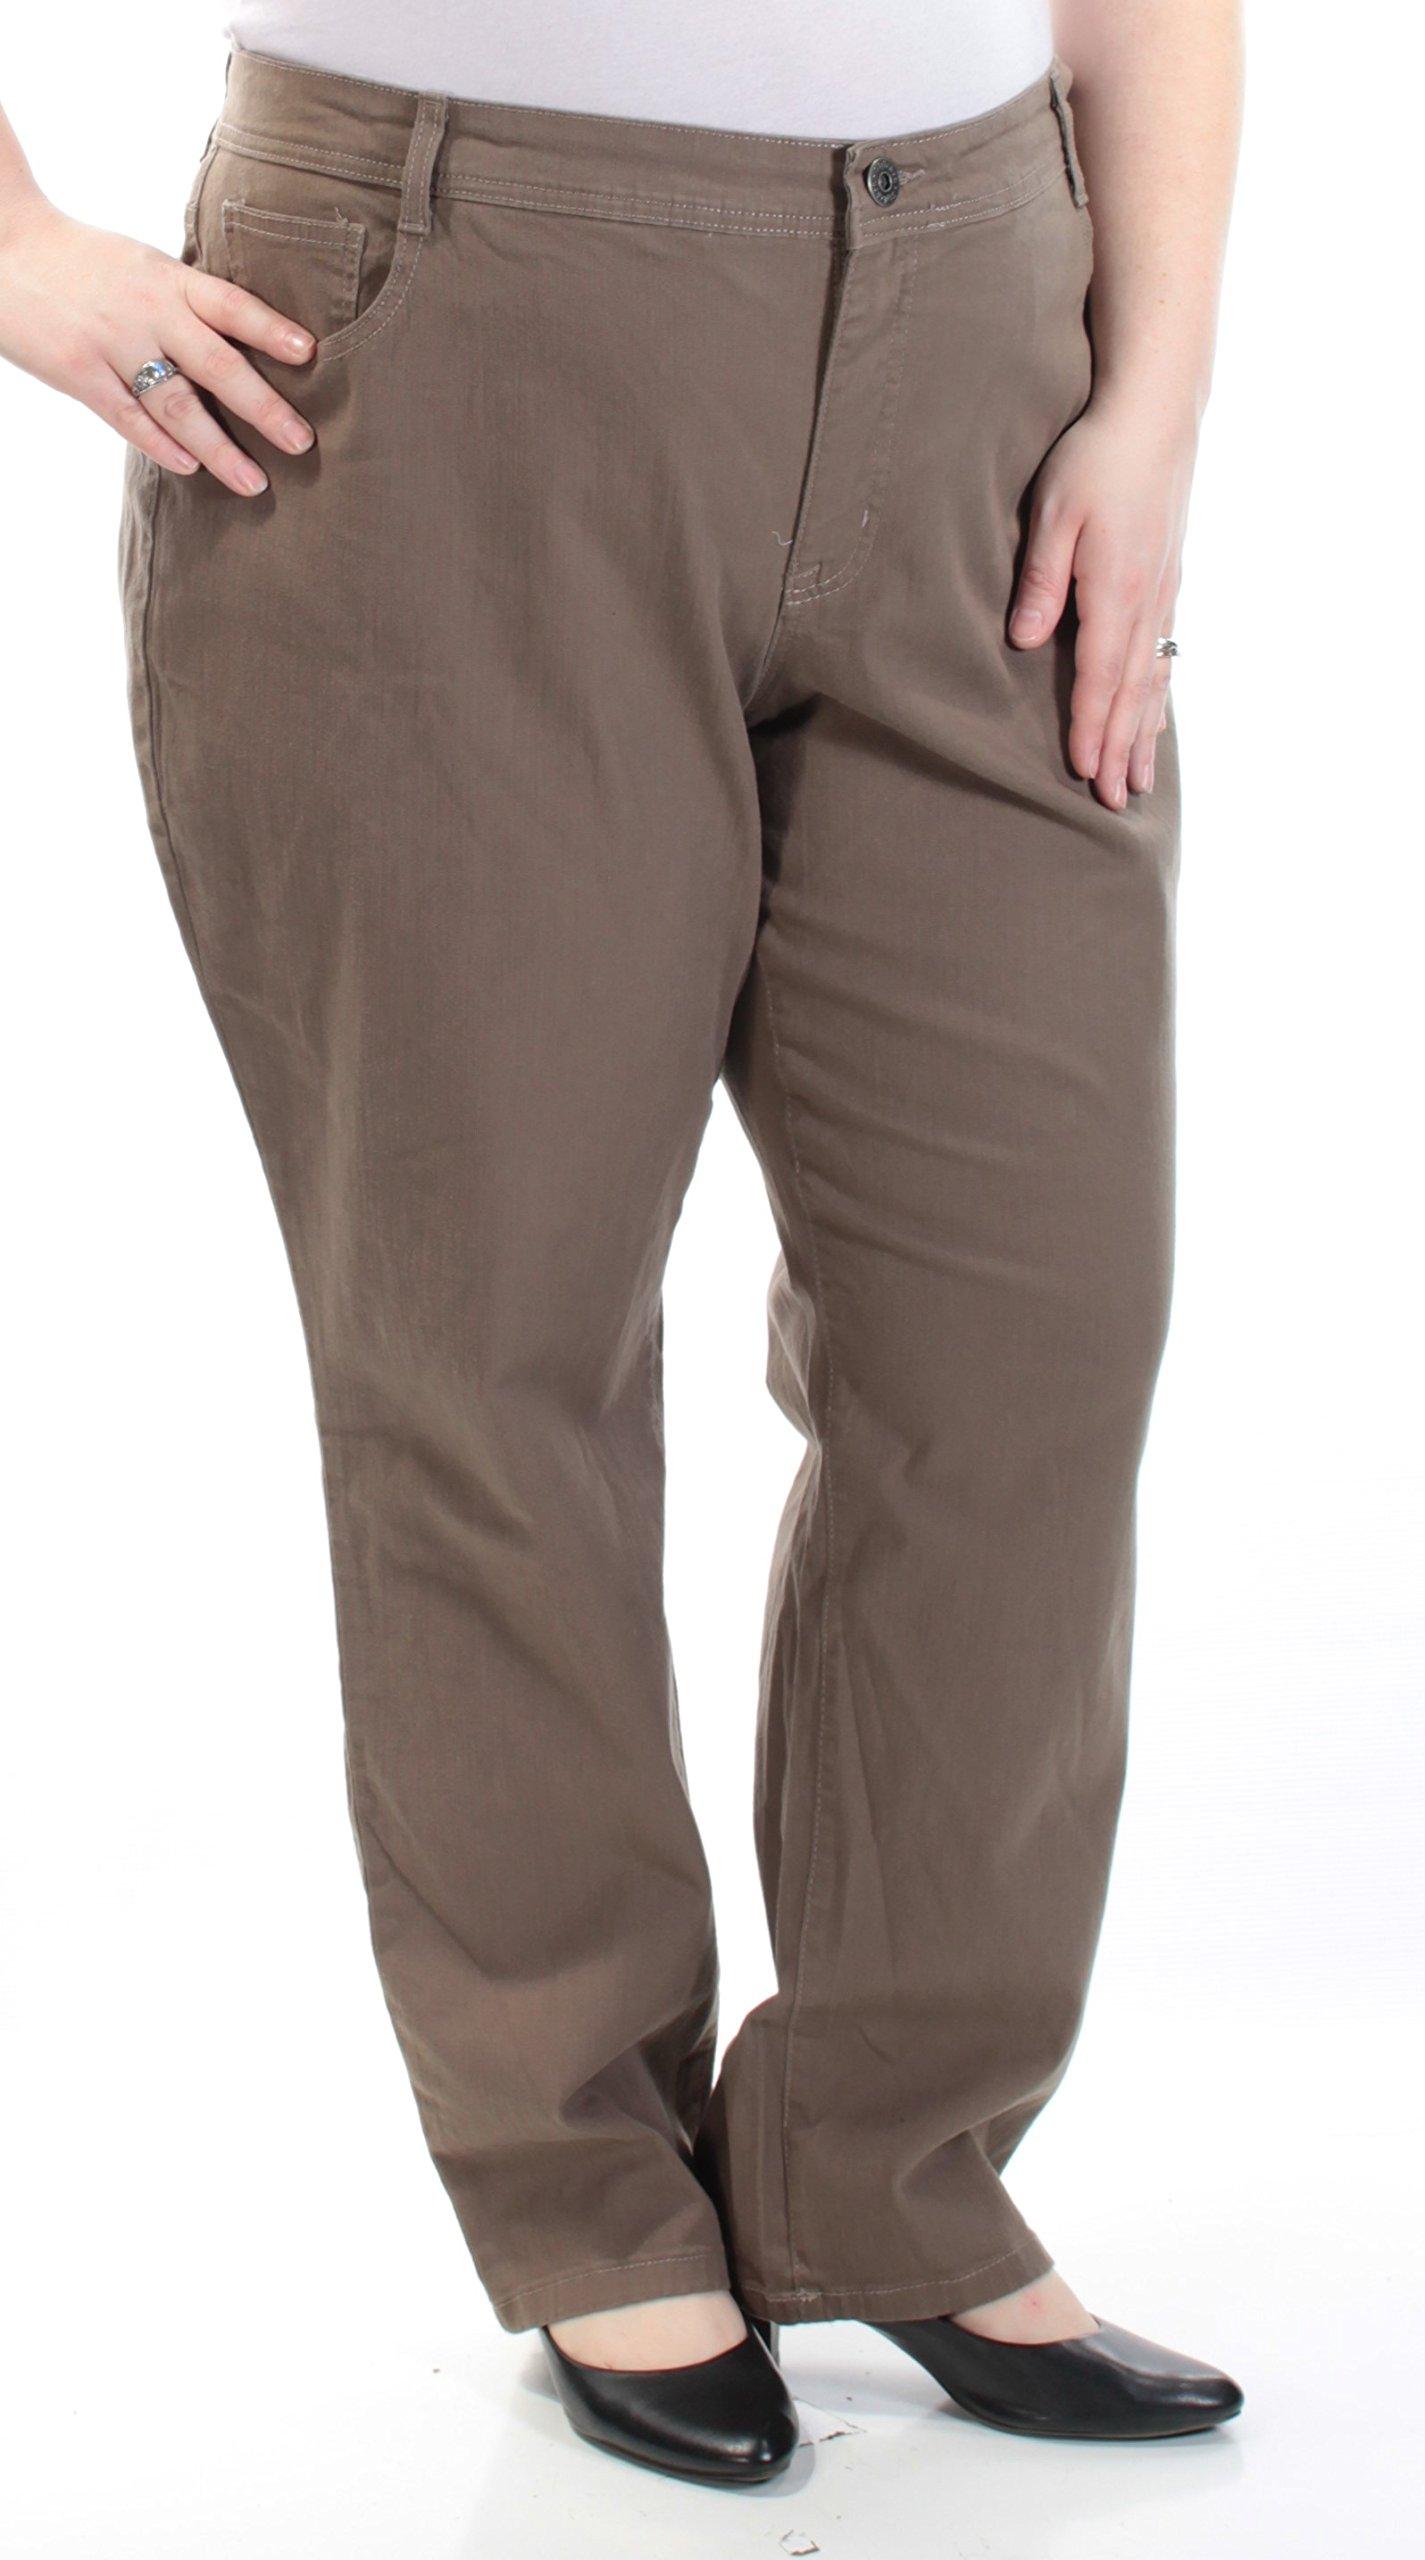 Style & Co. Womens Plus Denim Tummy Control Skinny Jeans Taupe 24W